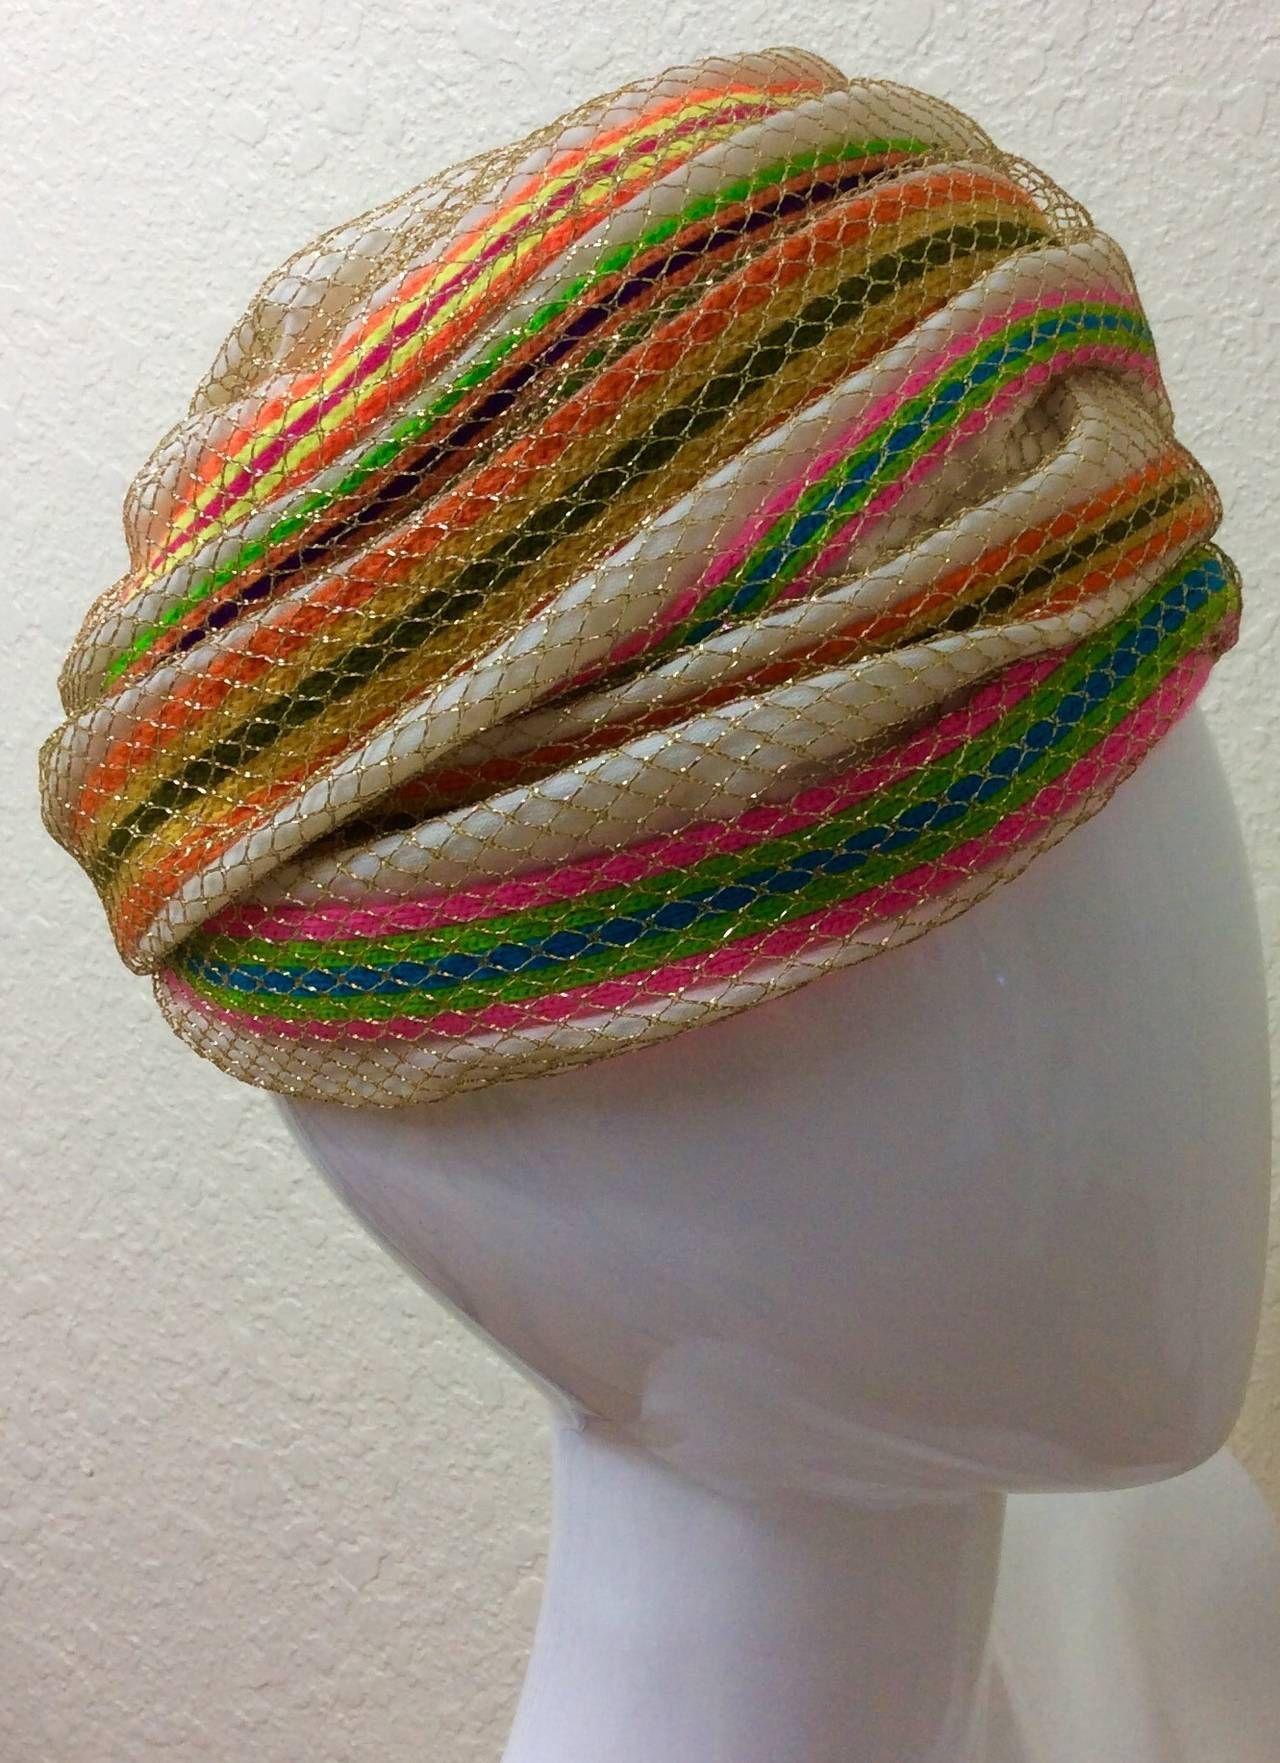 bcaa38d0eef Christian Dior turban 4